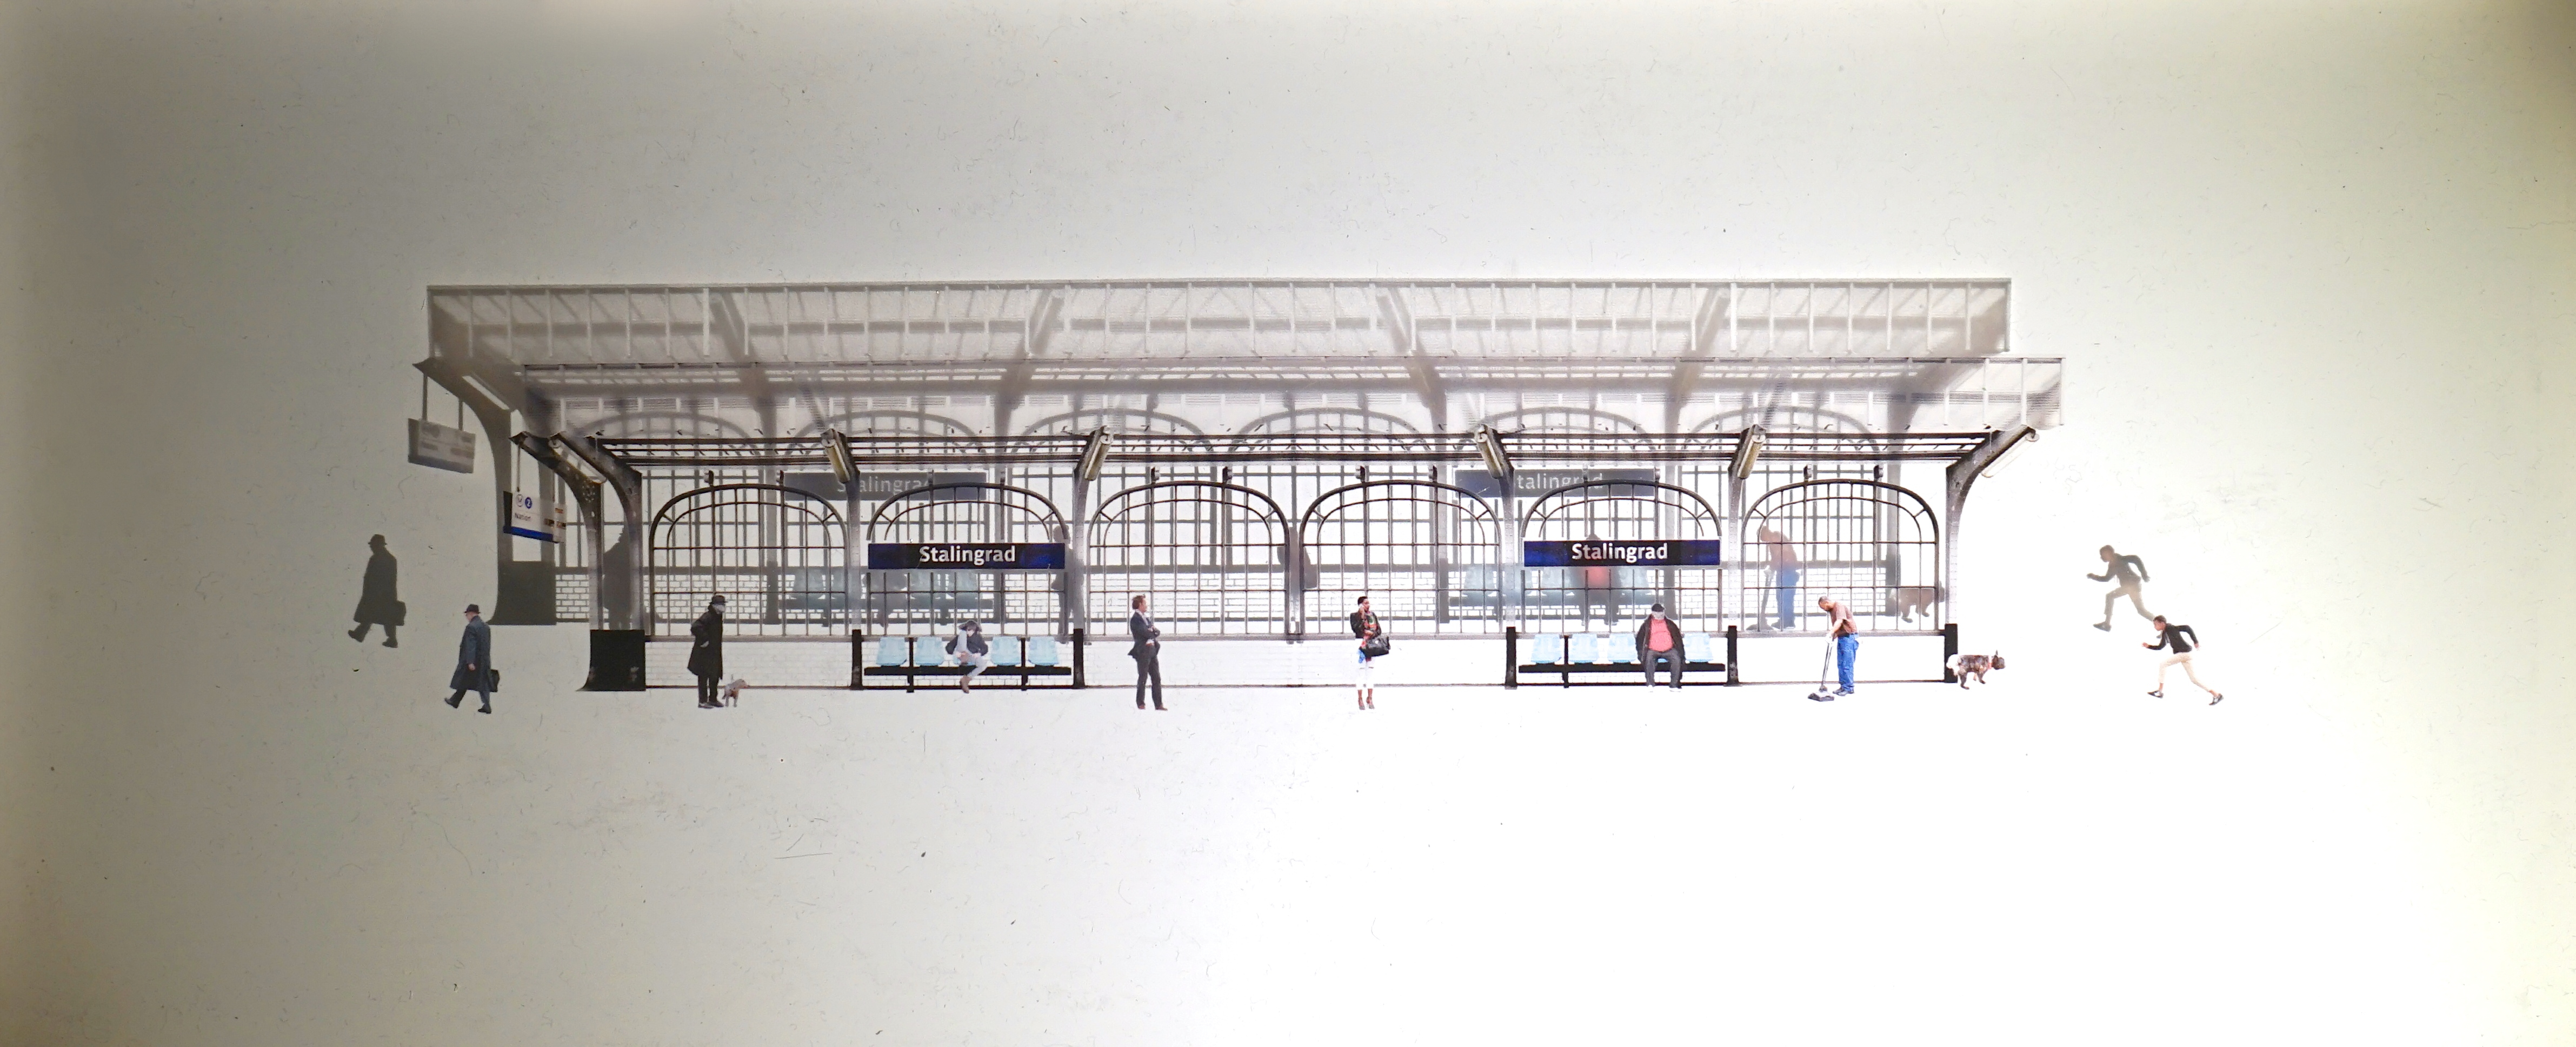 metro stalingrad 2016 format 20x45cm